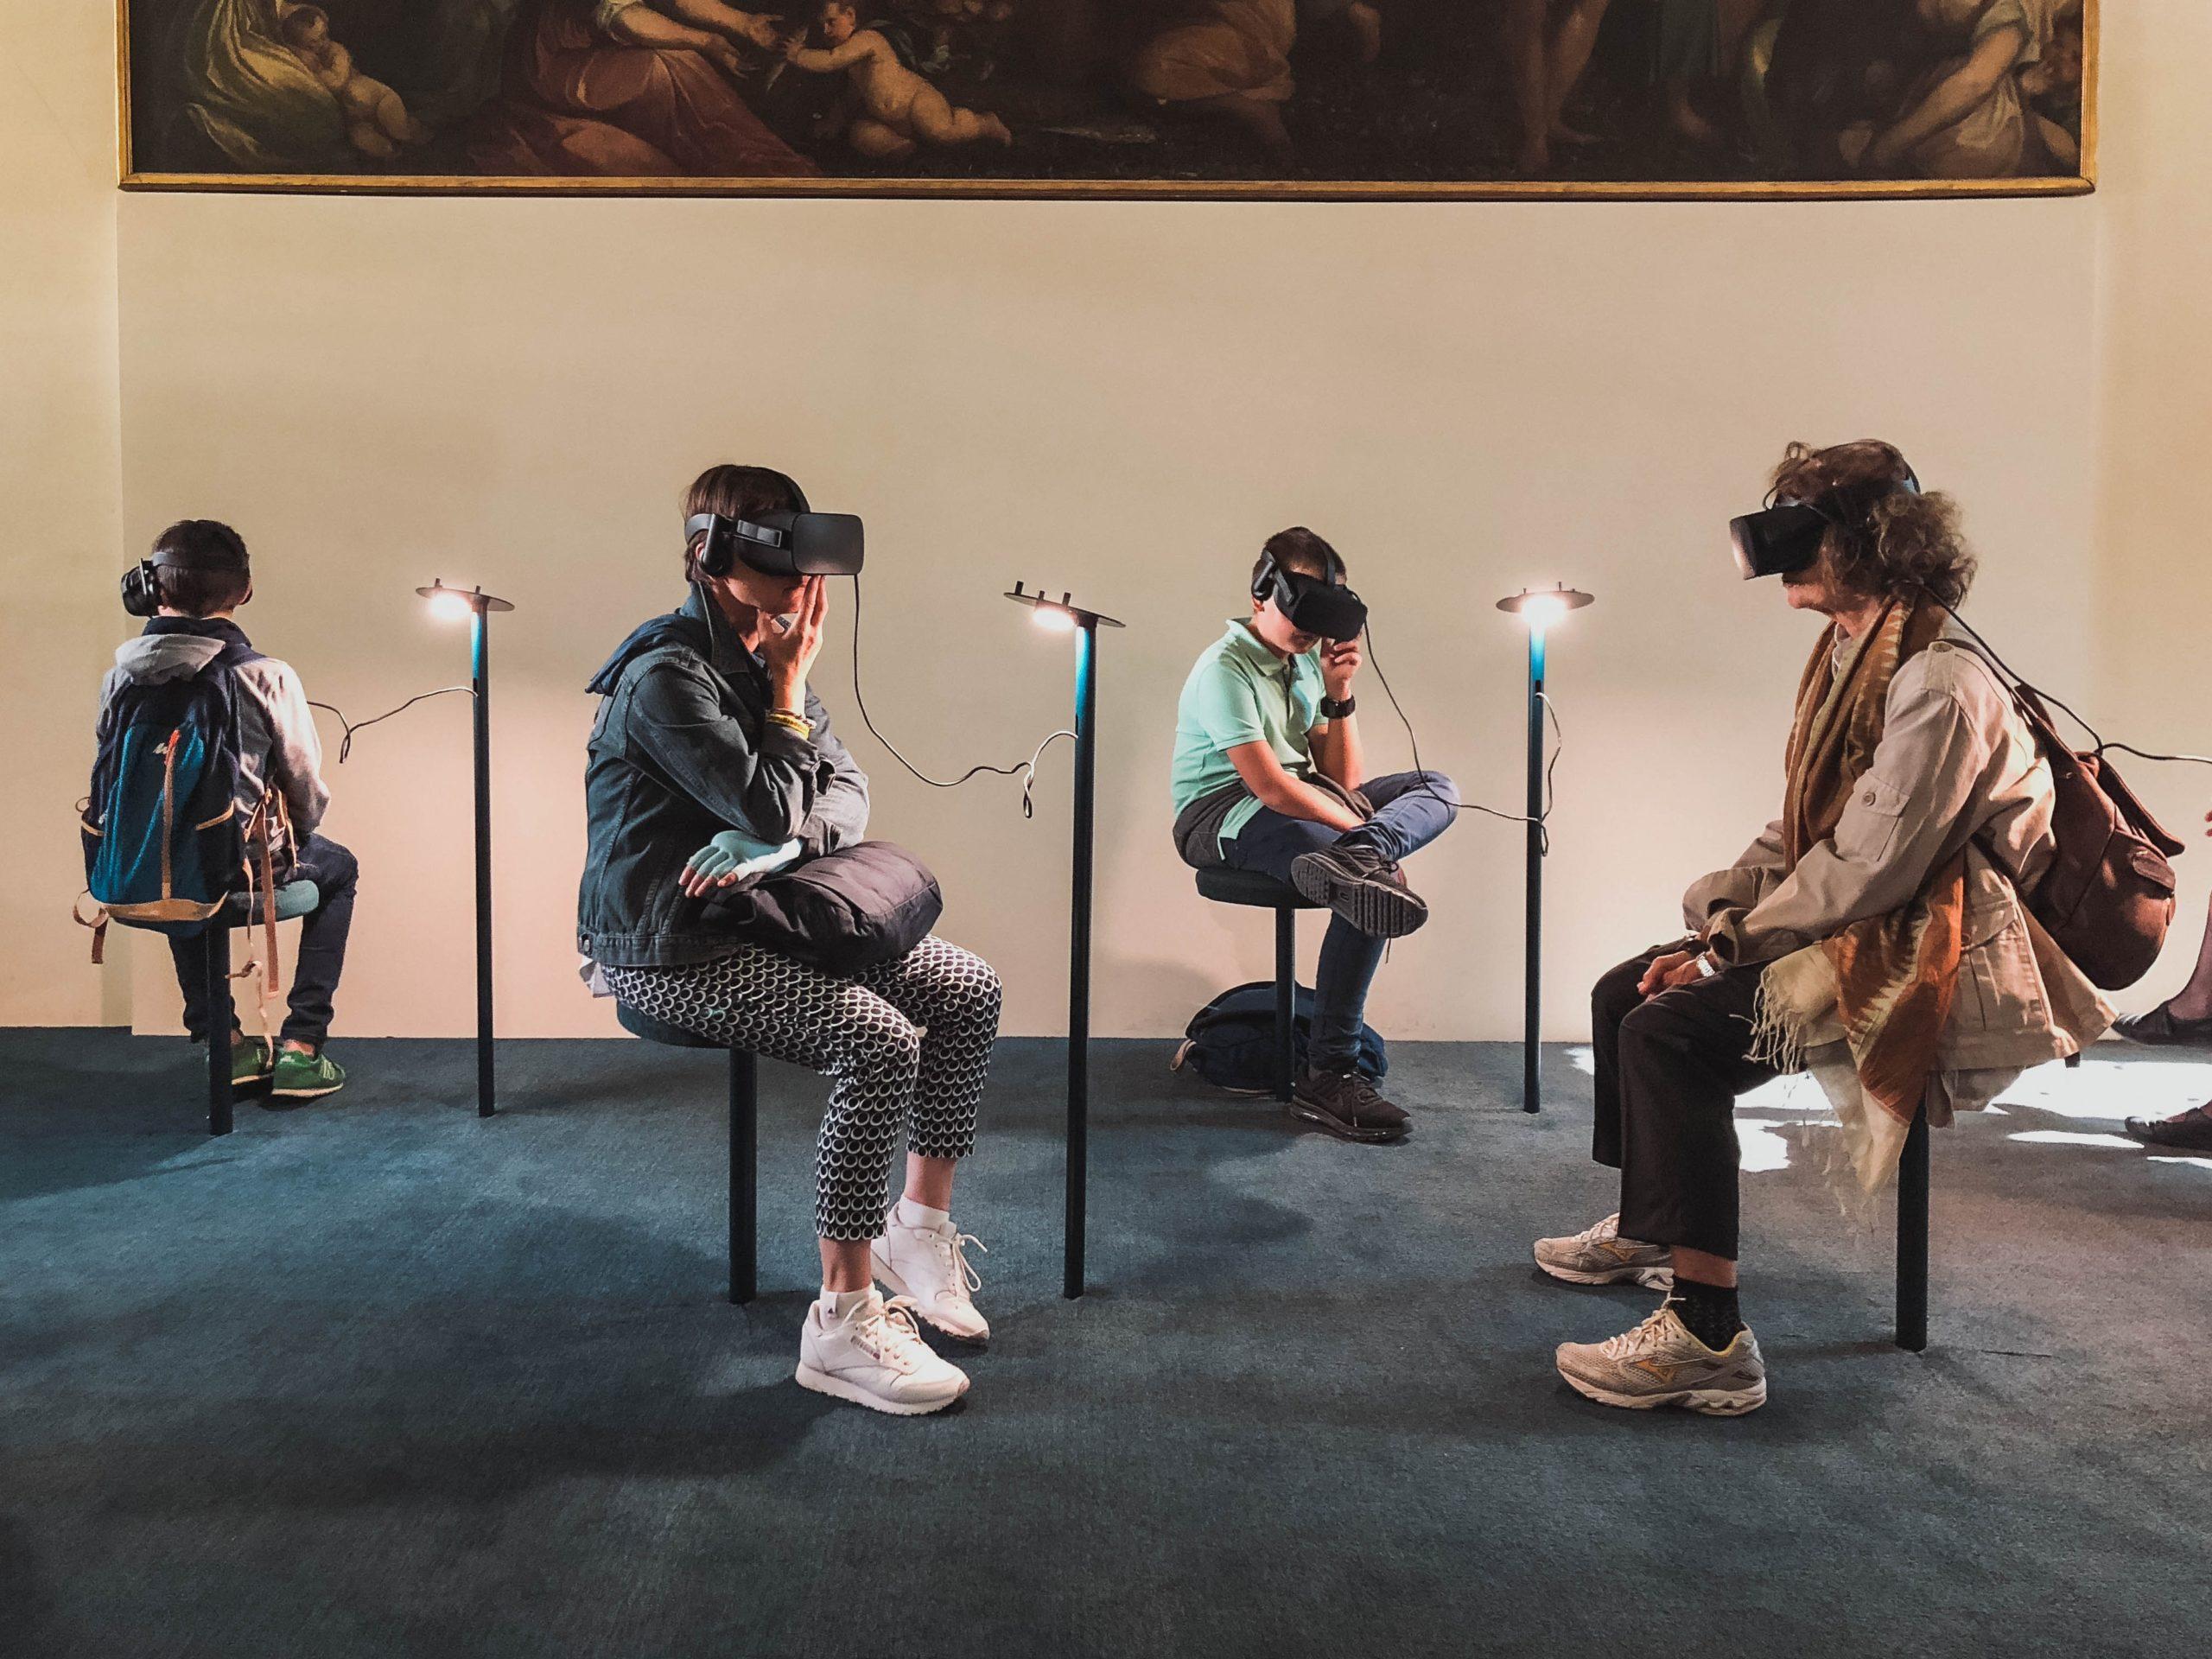 NewImages - XR3 Virtual Exhibition